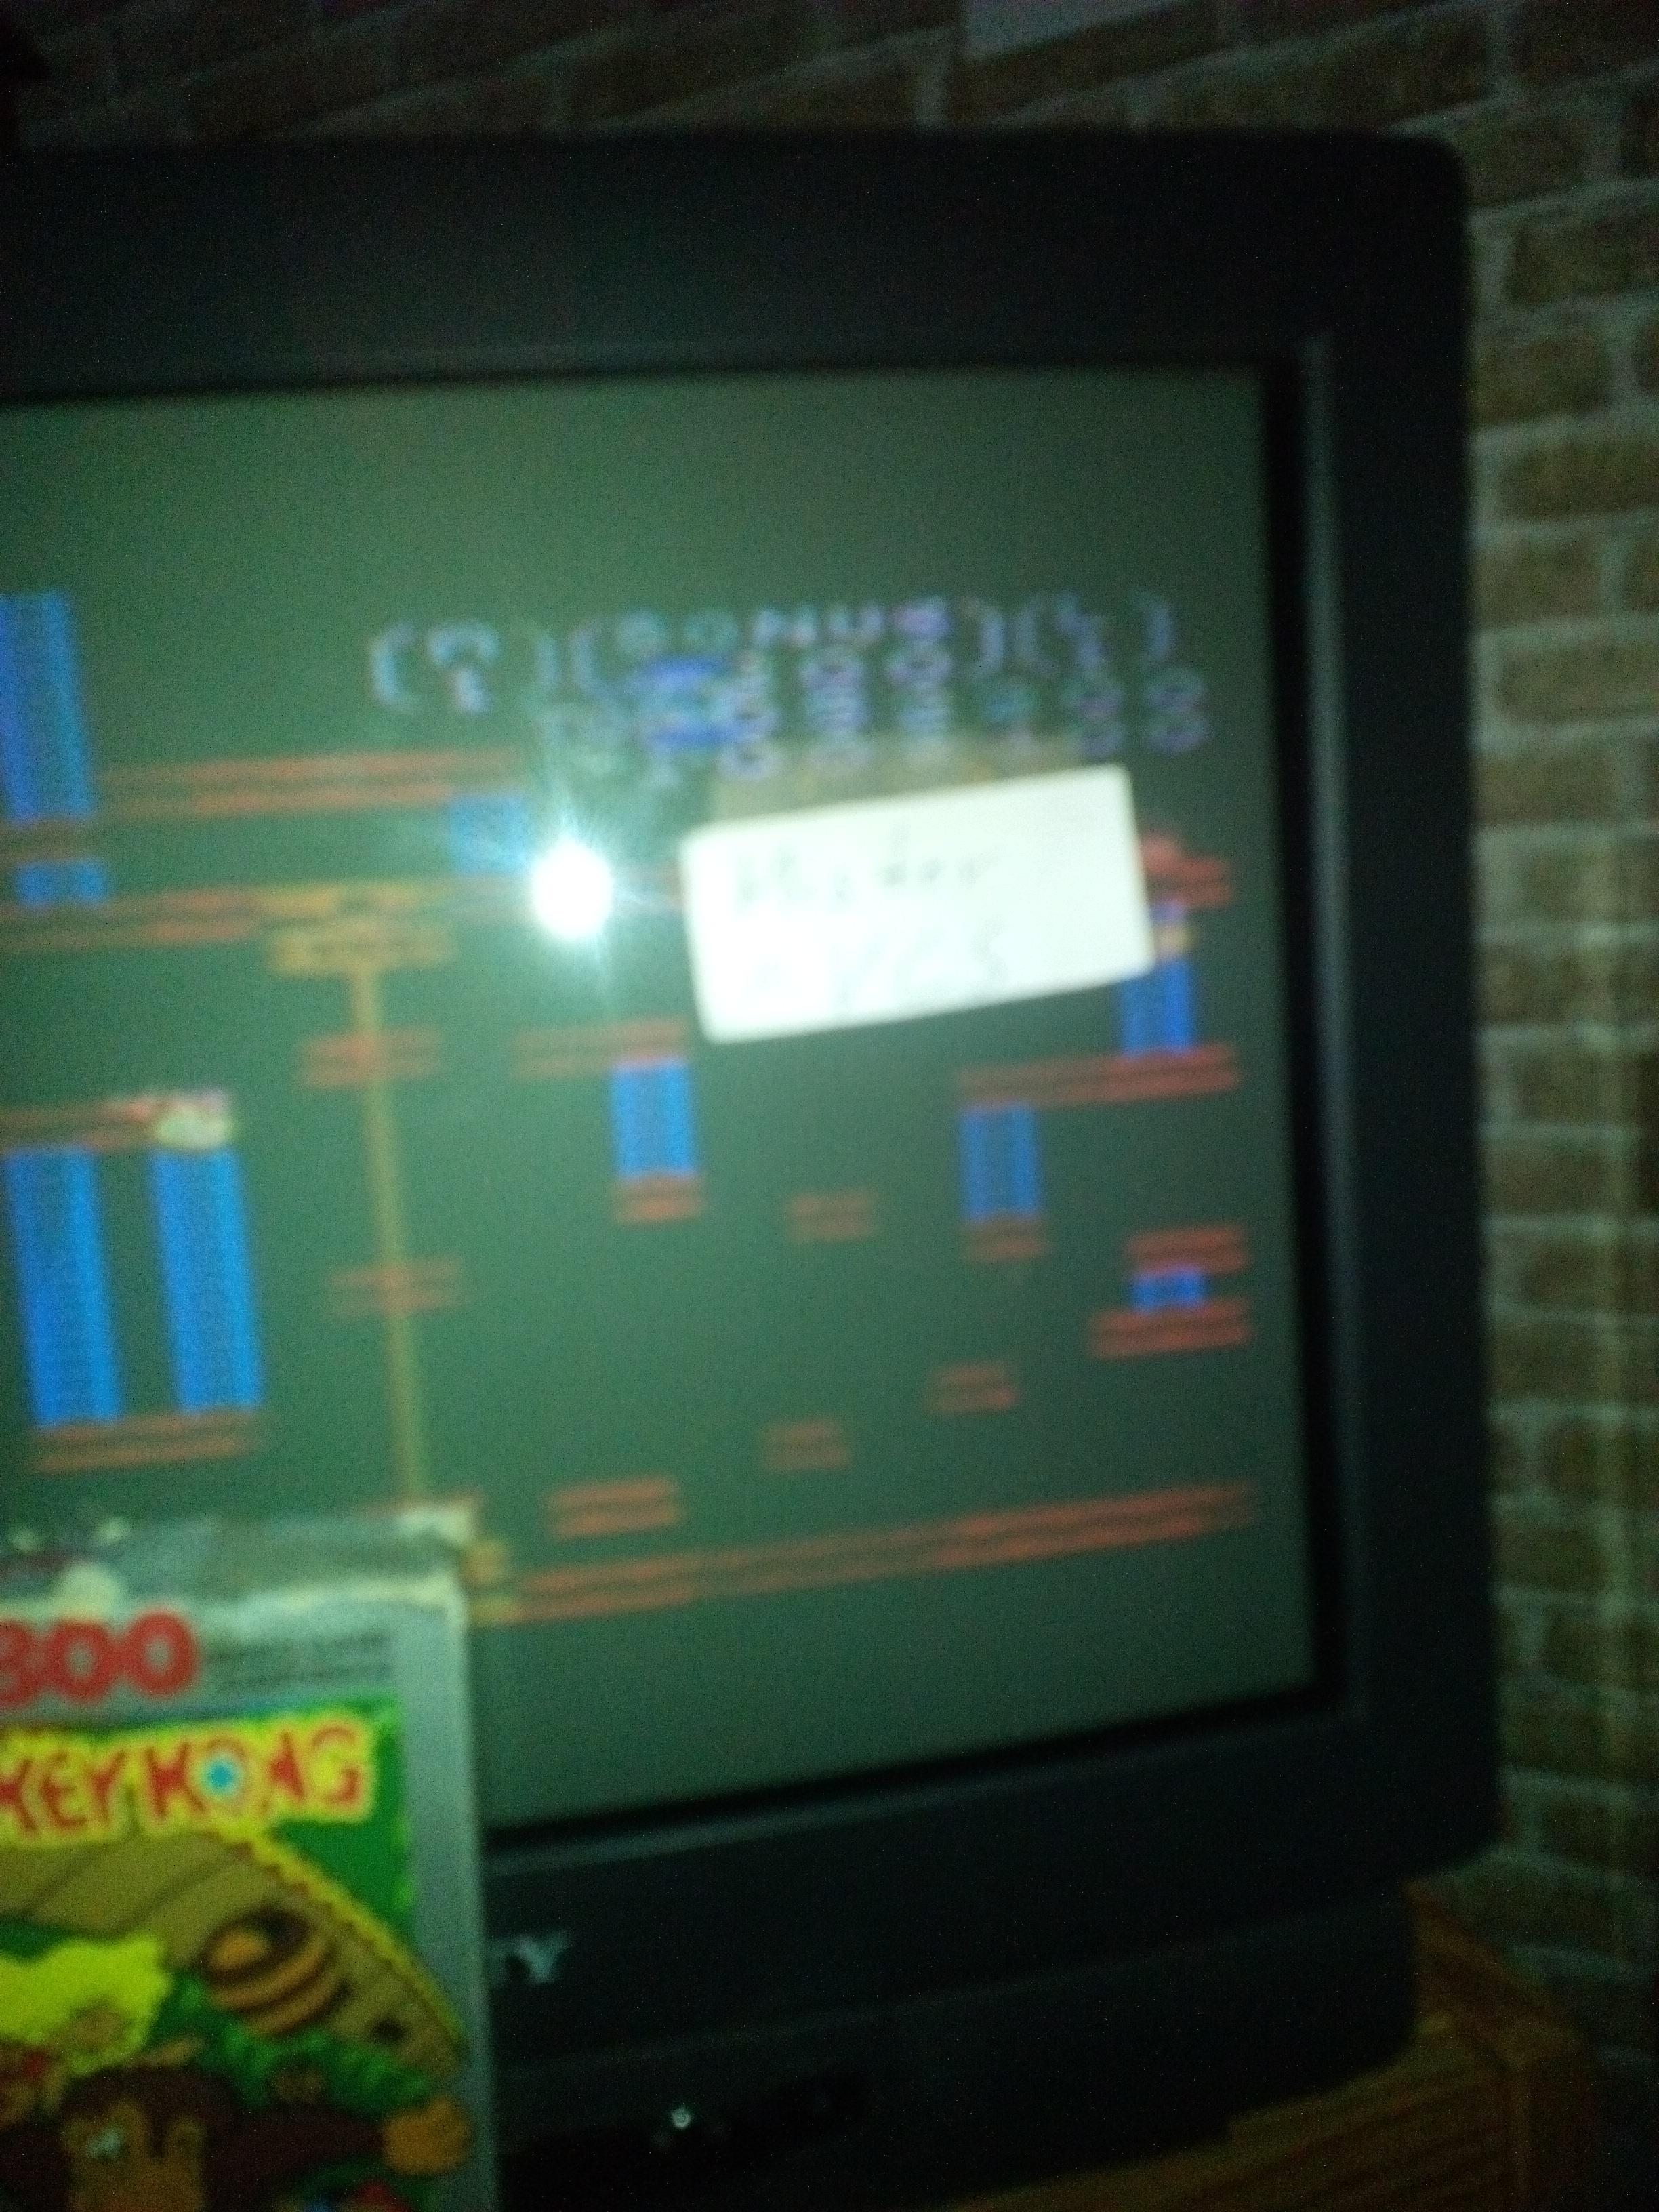 MisterVCS: Donkey Kong: Standard (Atari 7800) 52,200 points on 2017-11-05 07:38:09